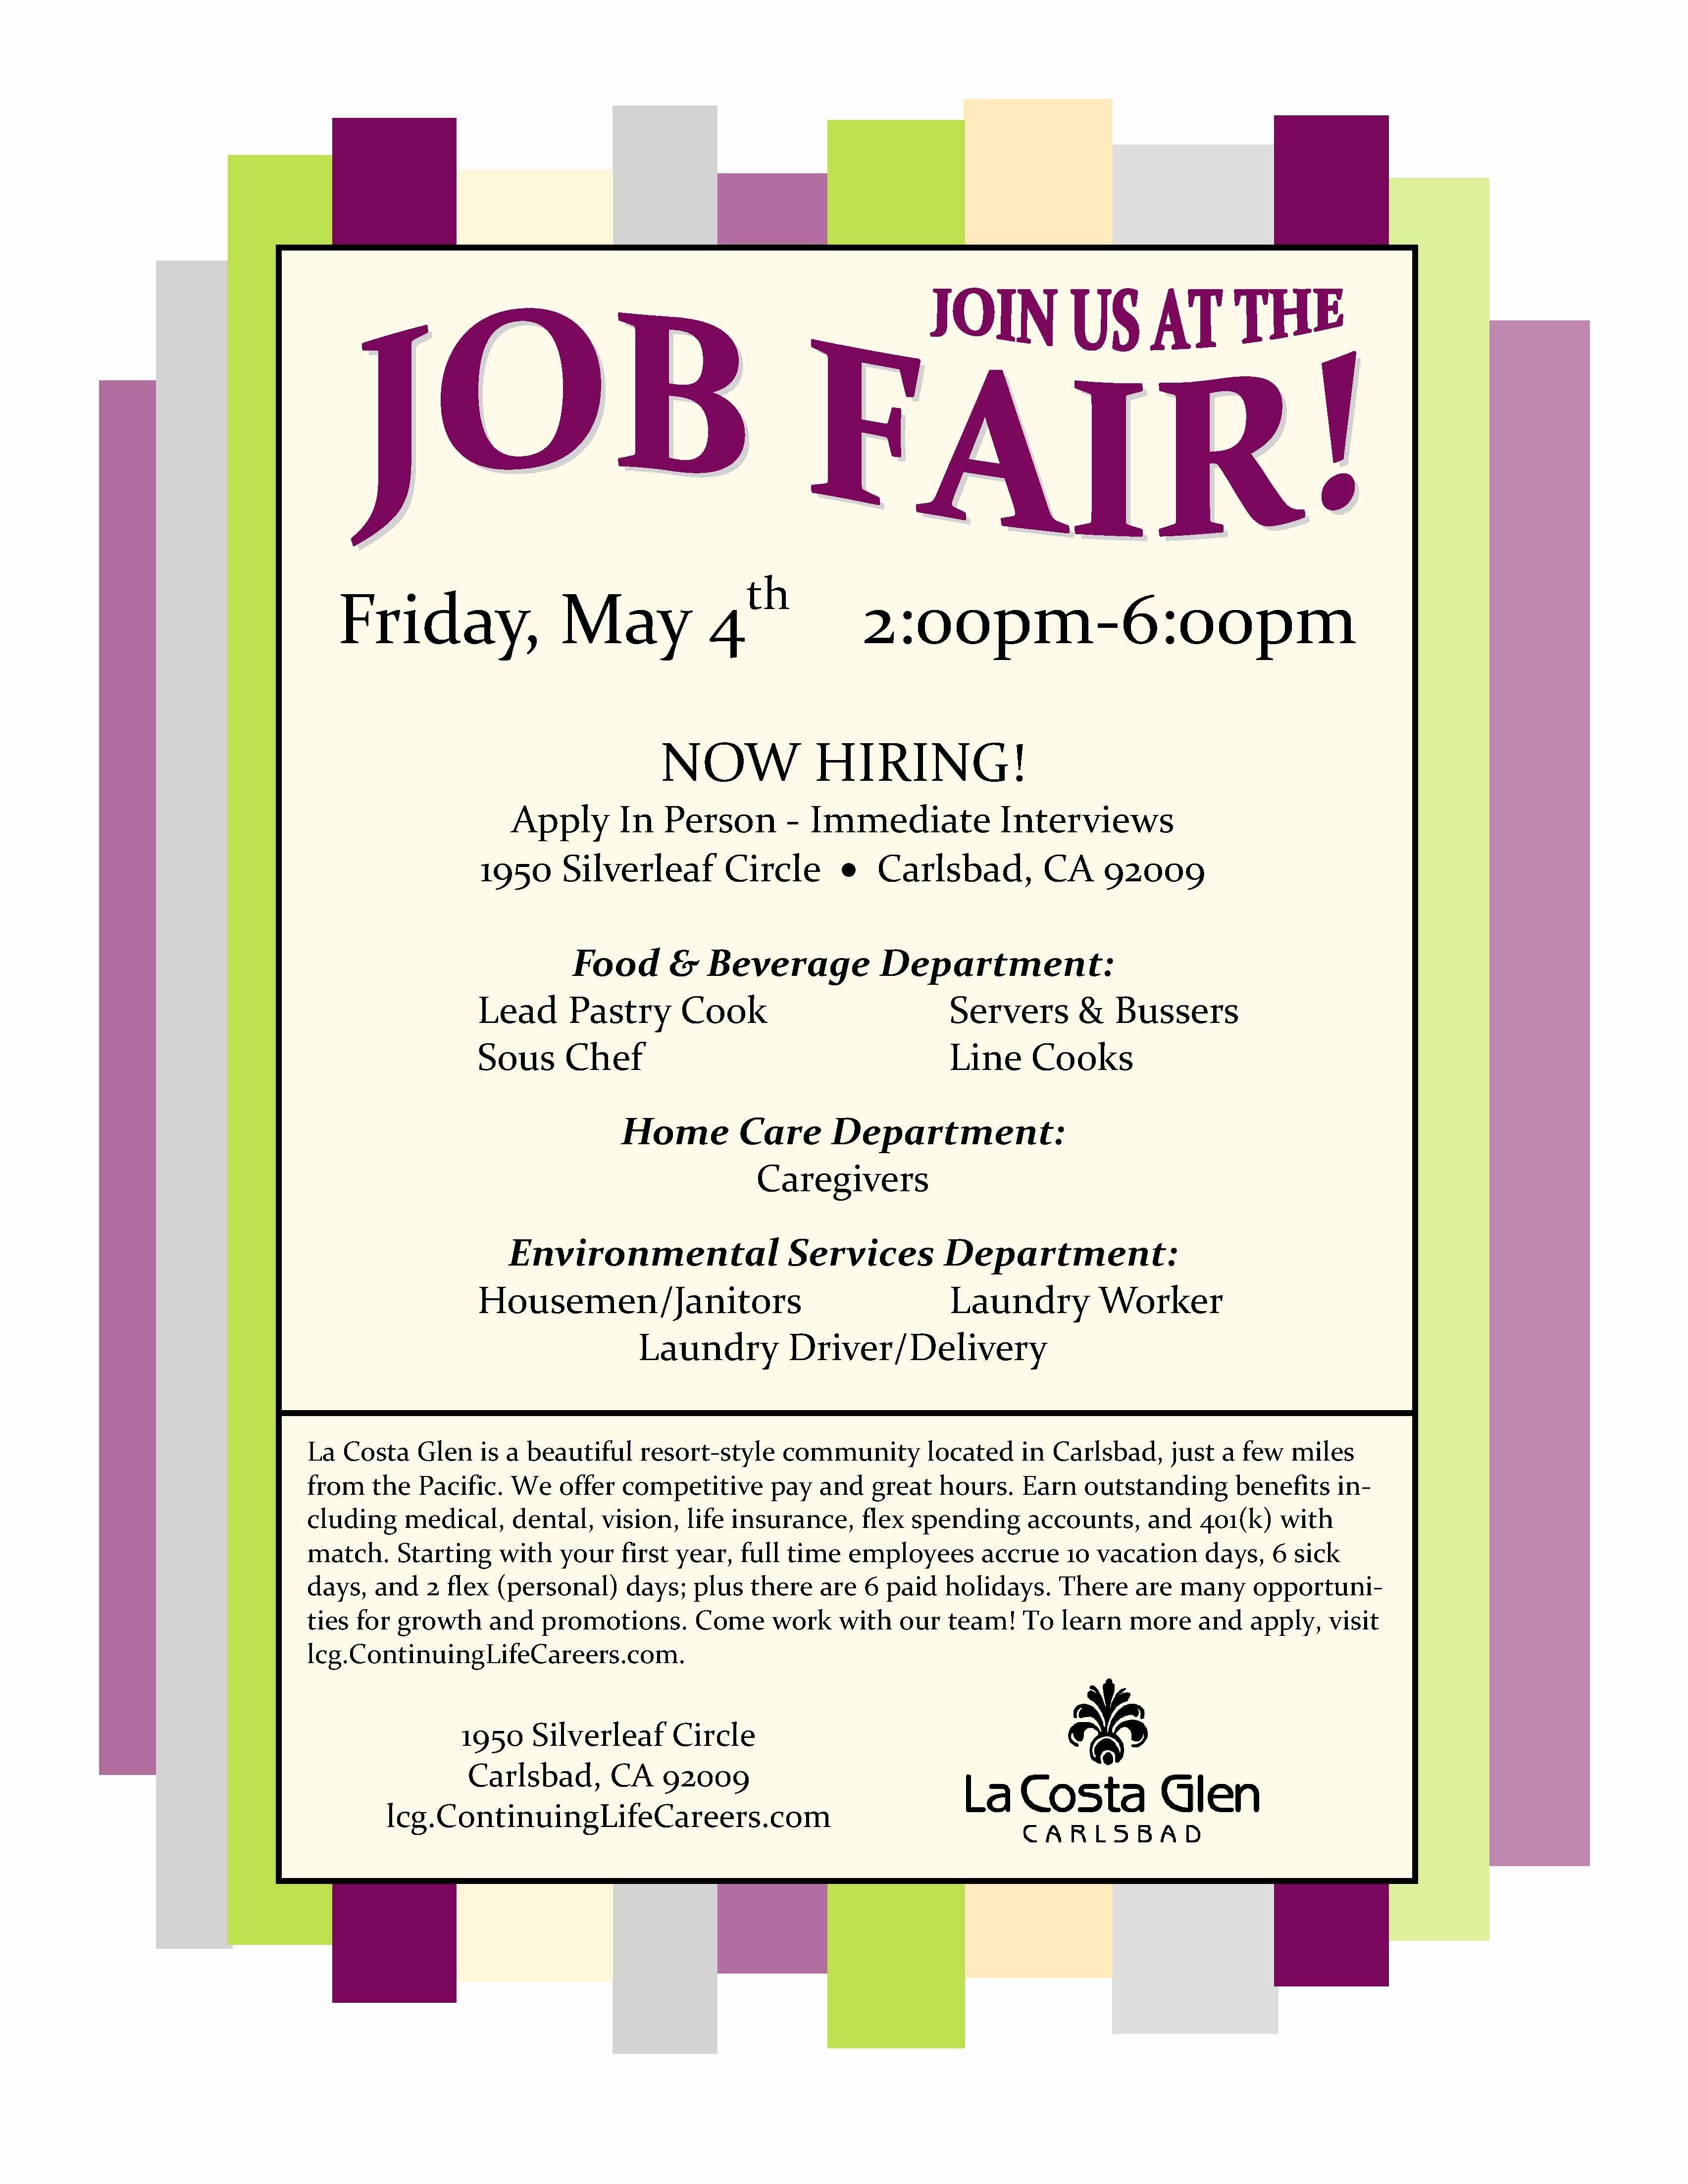 Job Fair Flyer Template Awesome La Costa Glen Job Fair 5 4